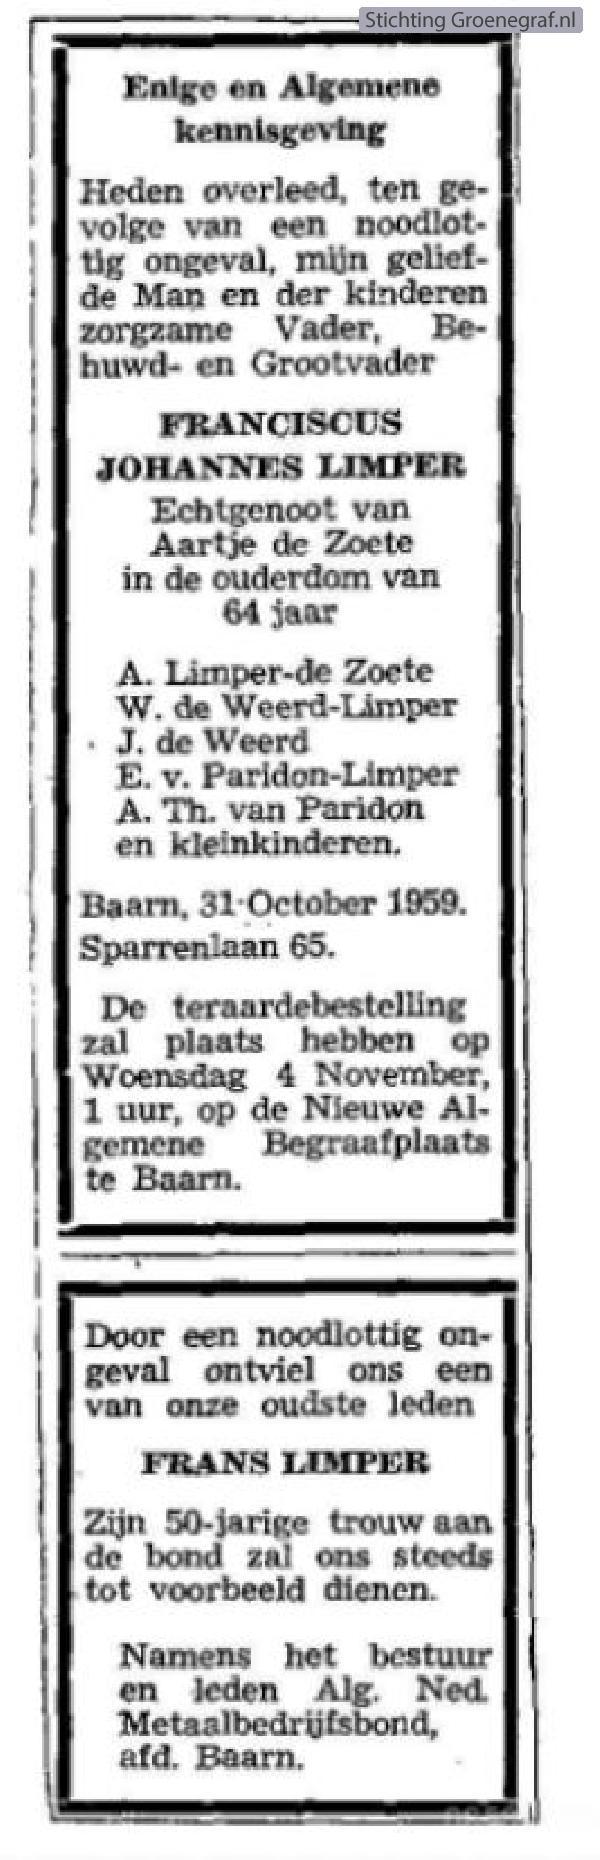 Overlijdensscan Franciscus Johannes  Limper